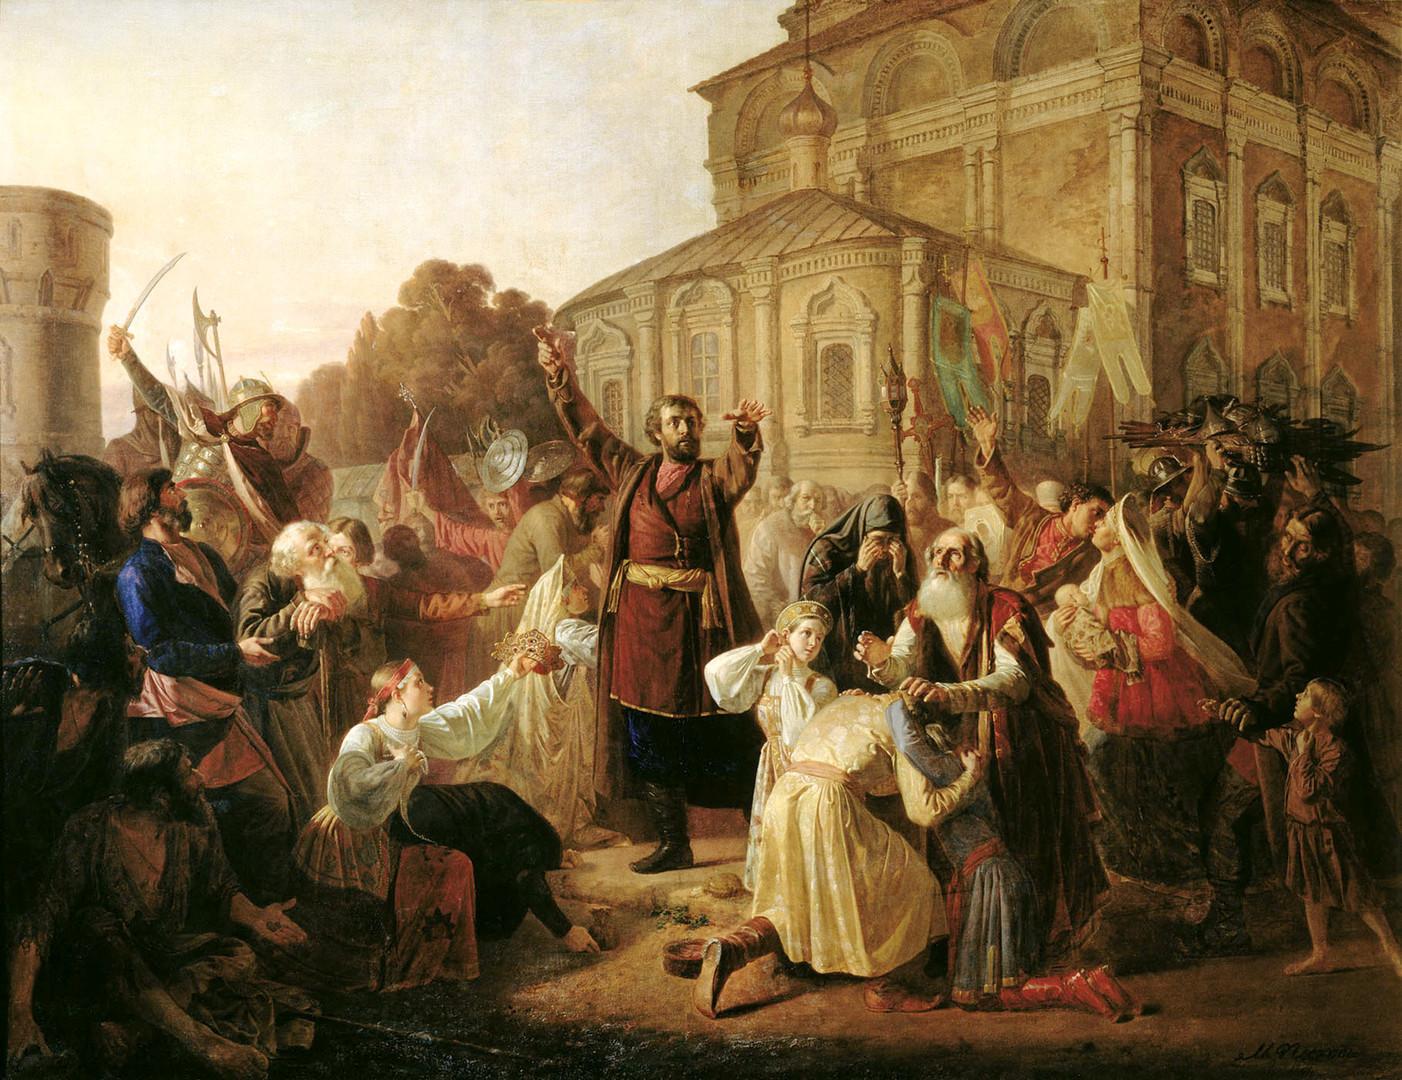 Kuzma Minin kliče Ruse k orožju, da bi Moskvo osvobodili izpod Poljakov.